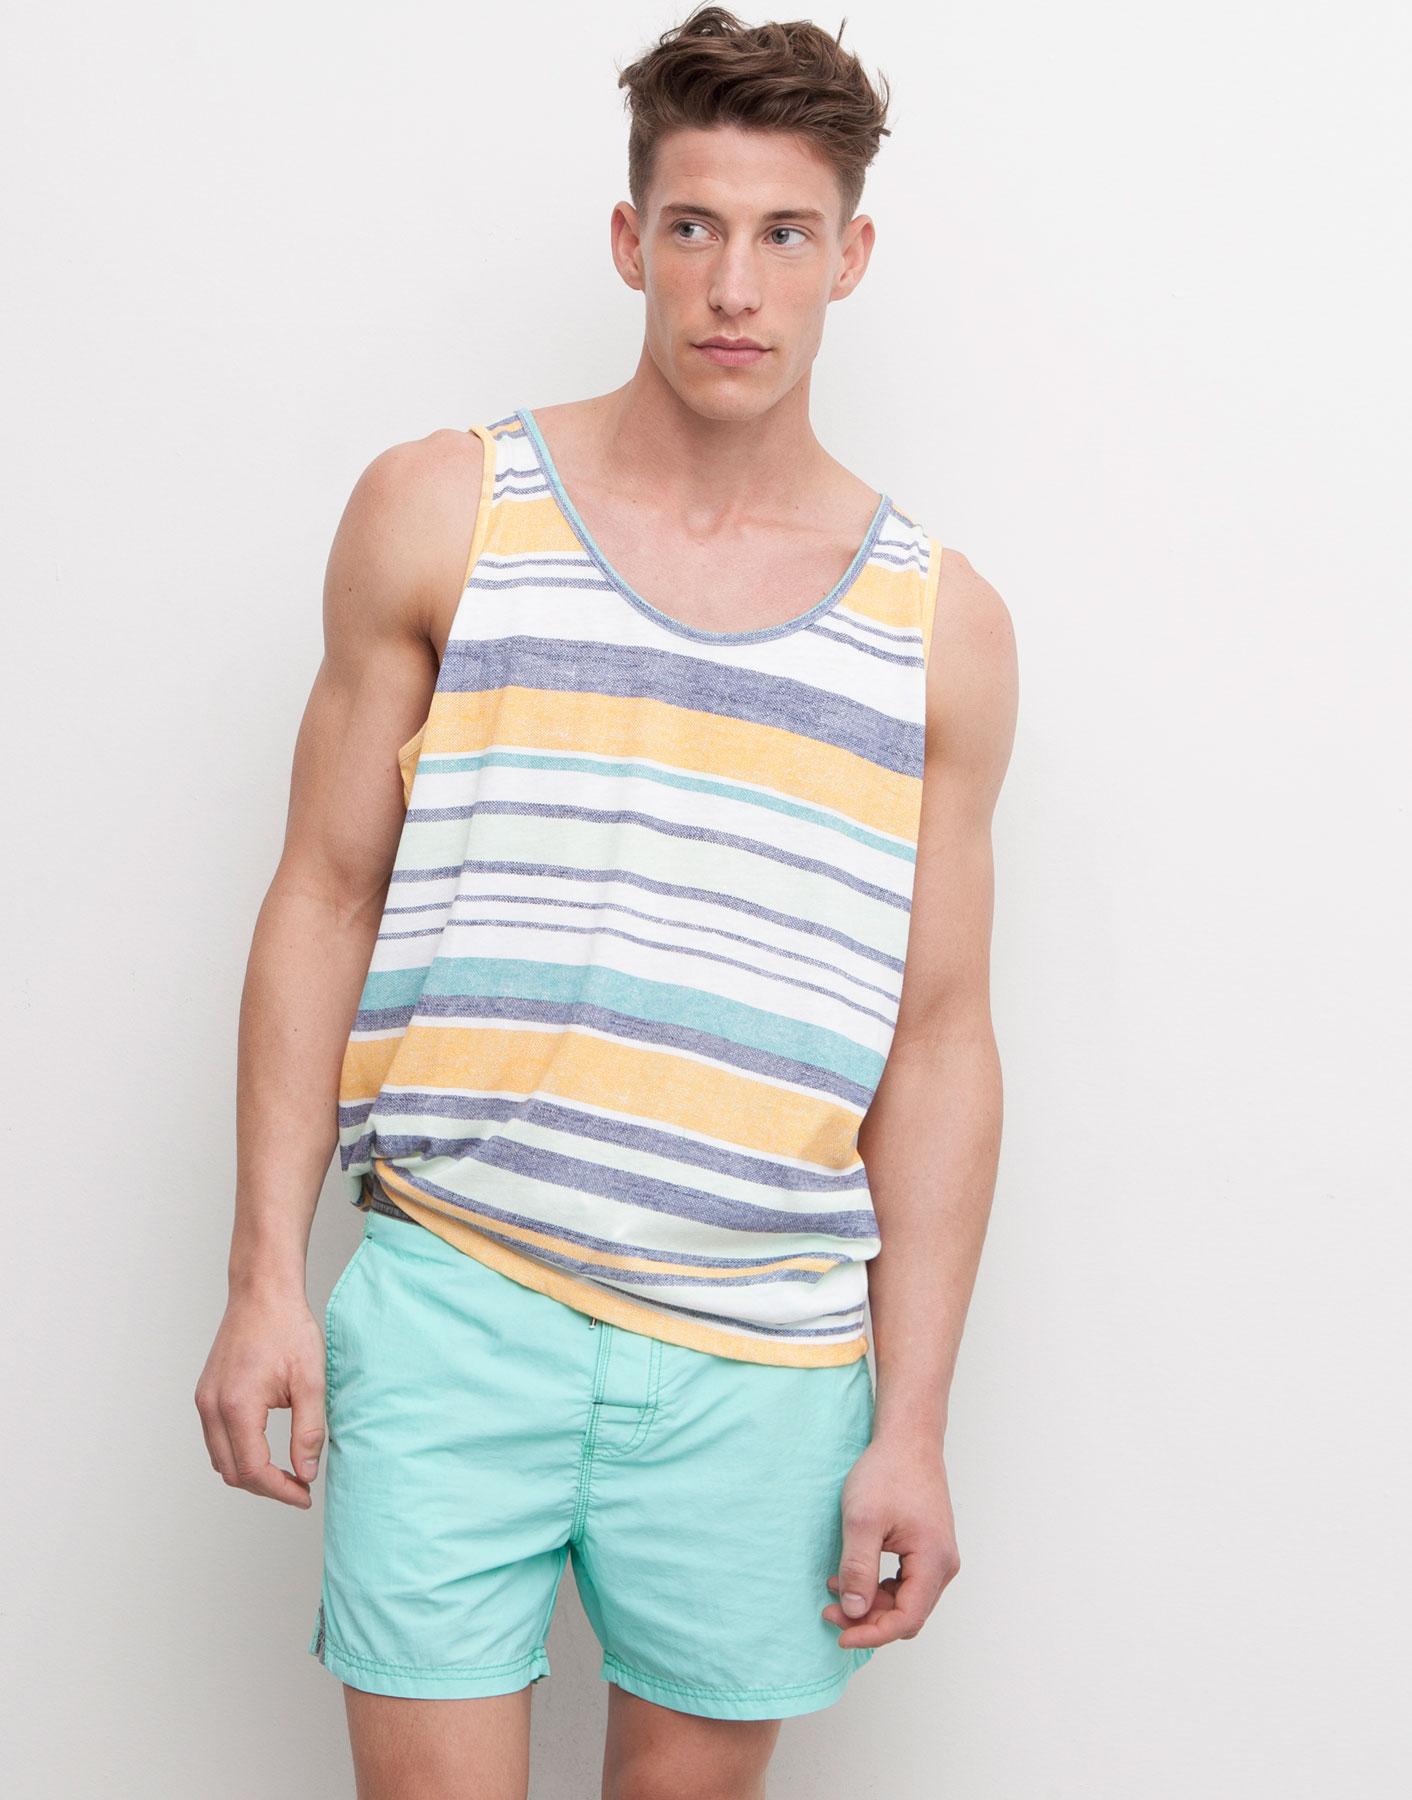 Pull & Bear S/S 2015 Beachwear Lookbook Pull & Bear S/S 2015 Beachwear Lookbook Vanity Teen Menswear & new faces magazine